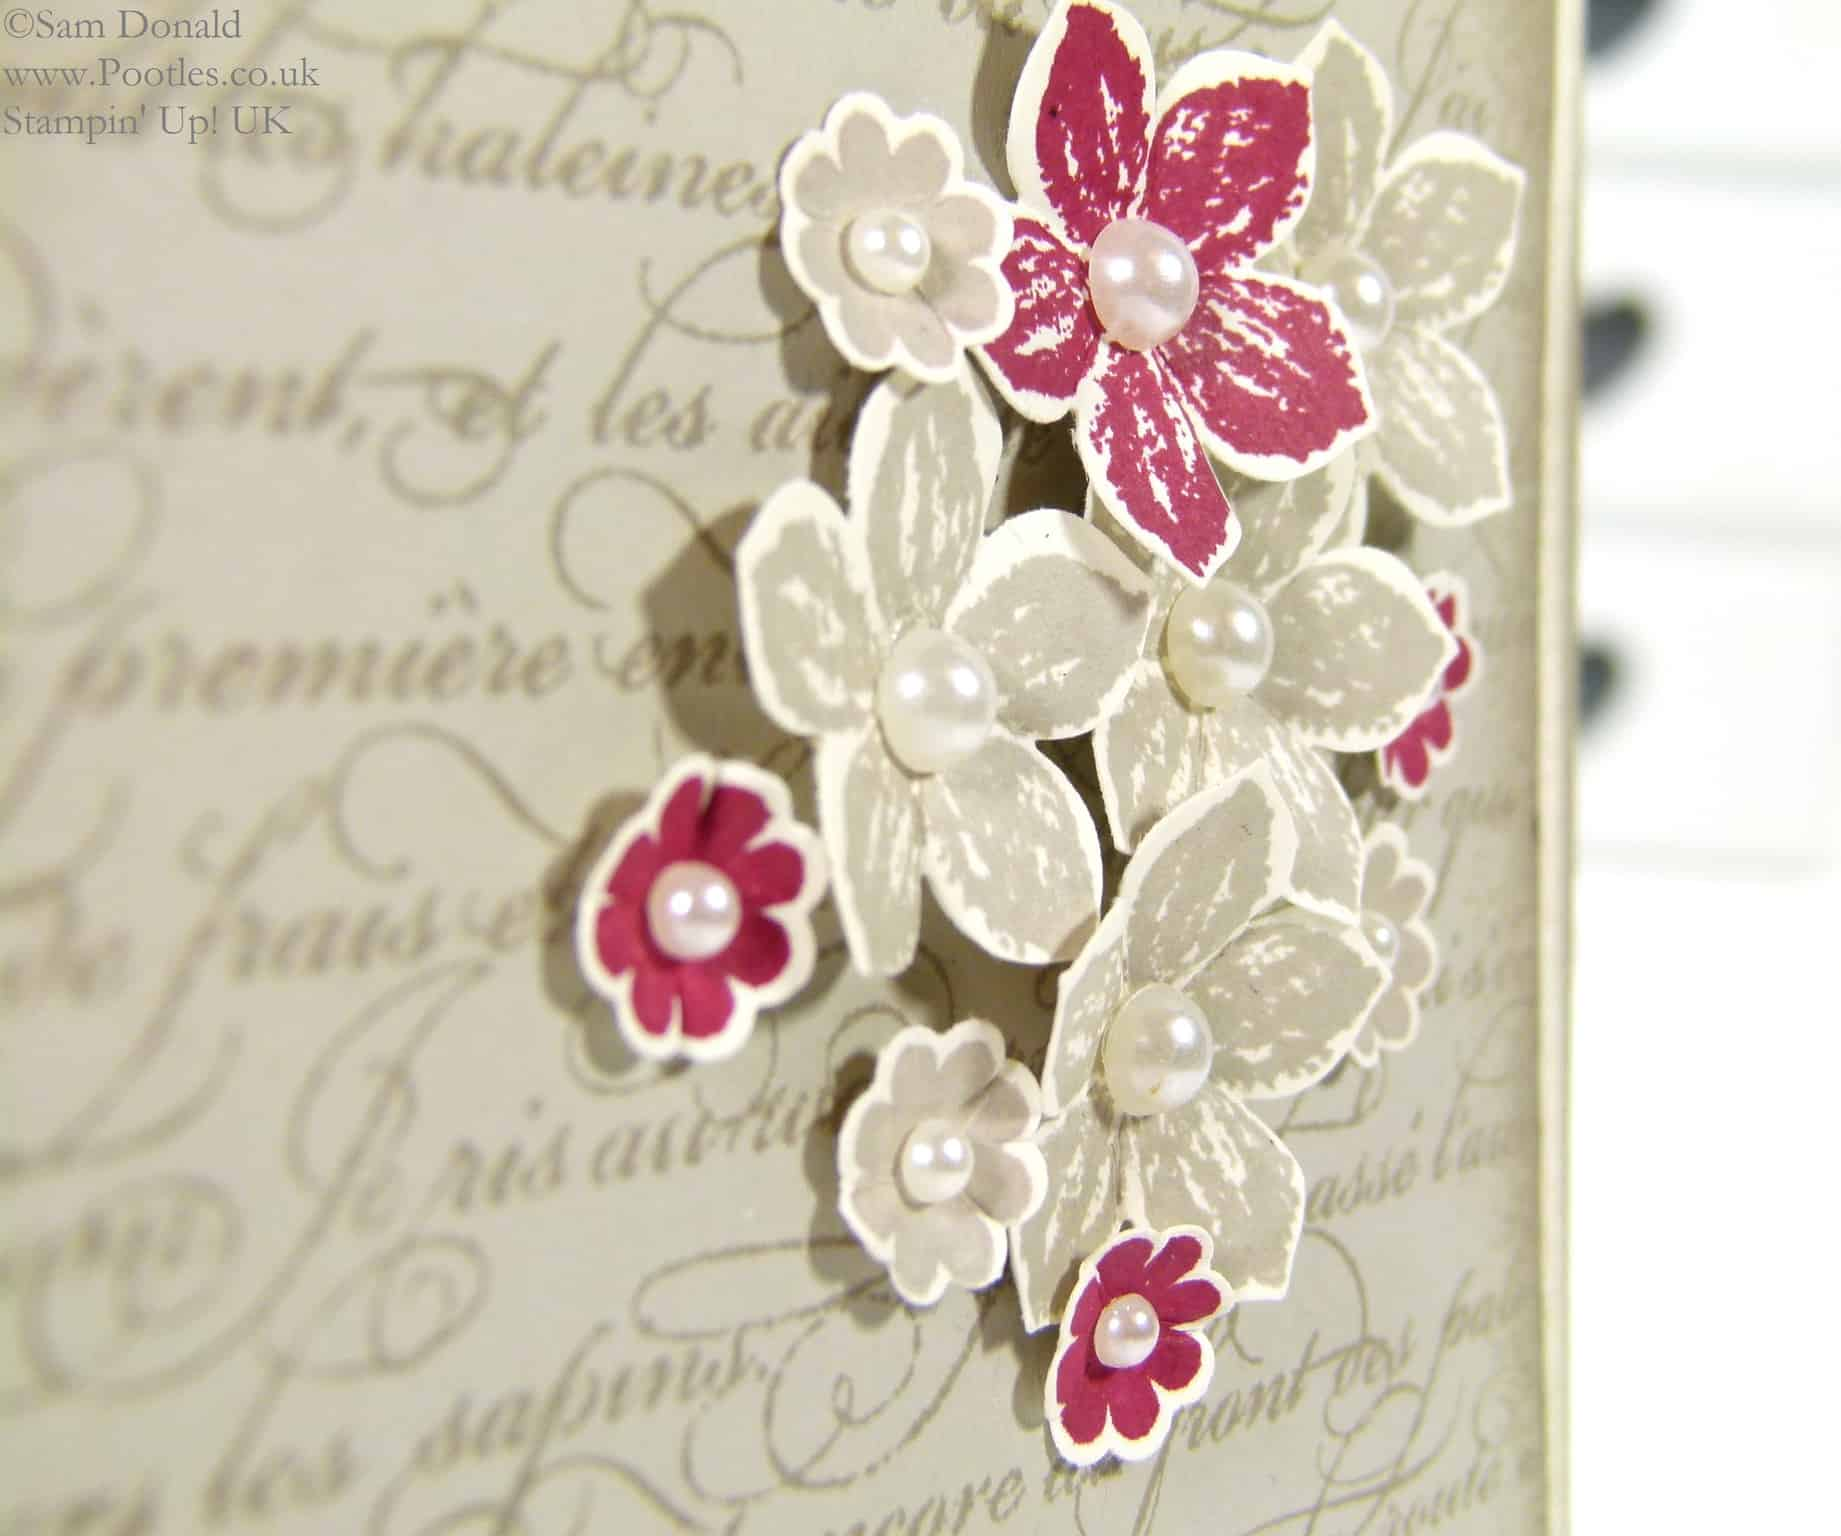 POOTLES Stampin' Up! UK En Francais meets Petite Petals close up